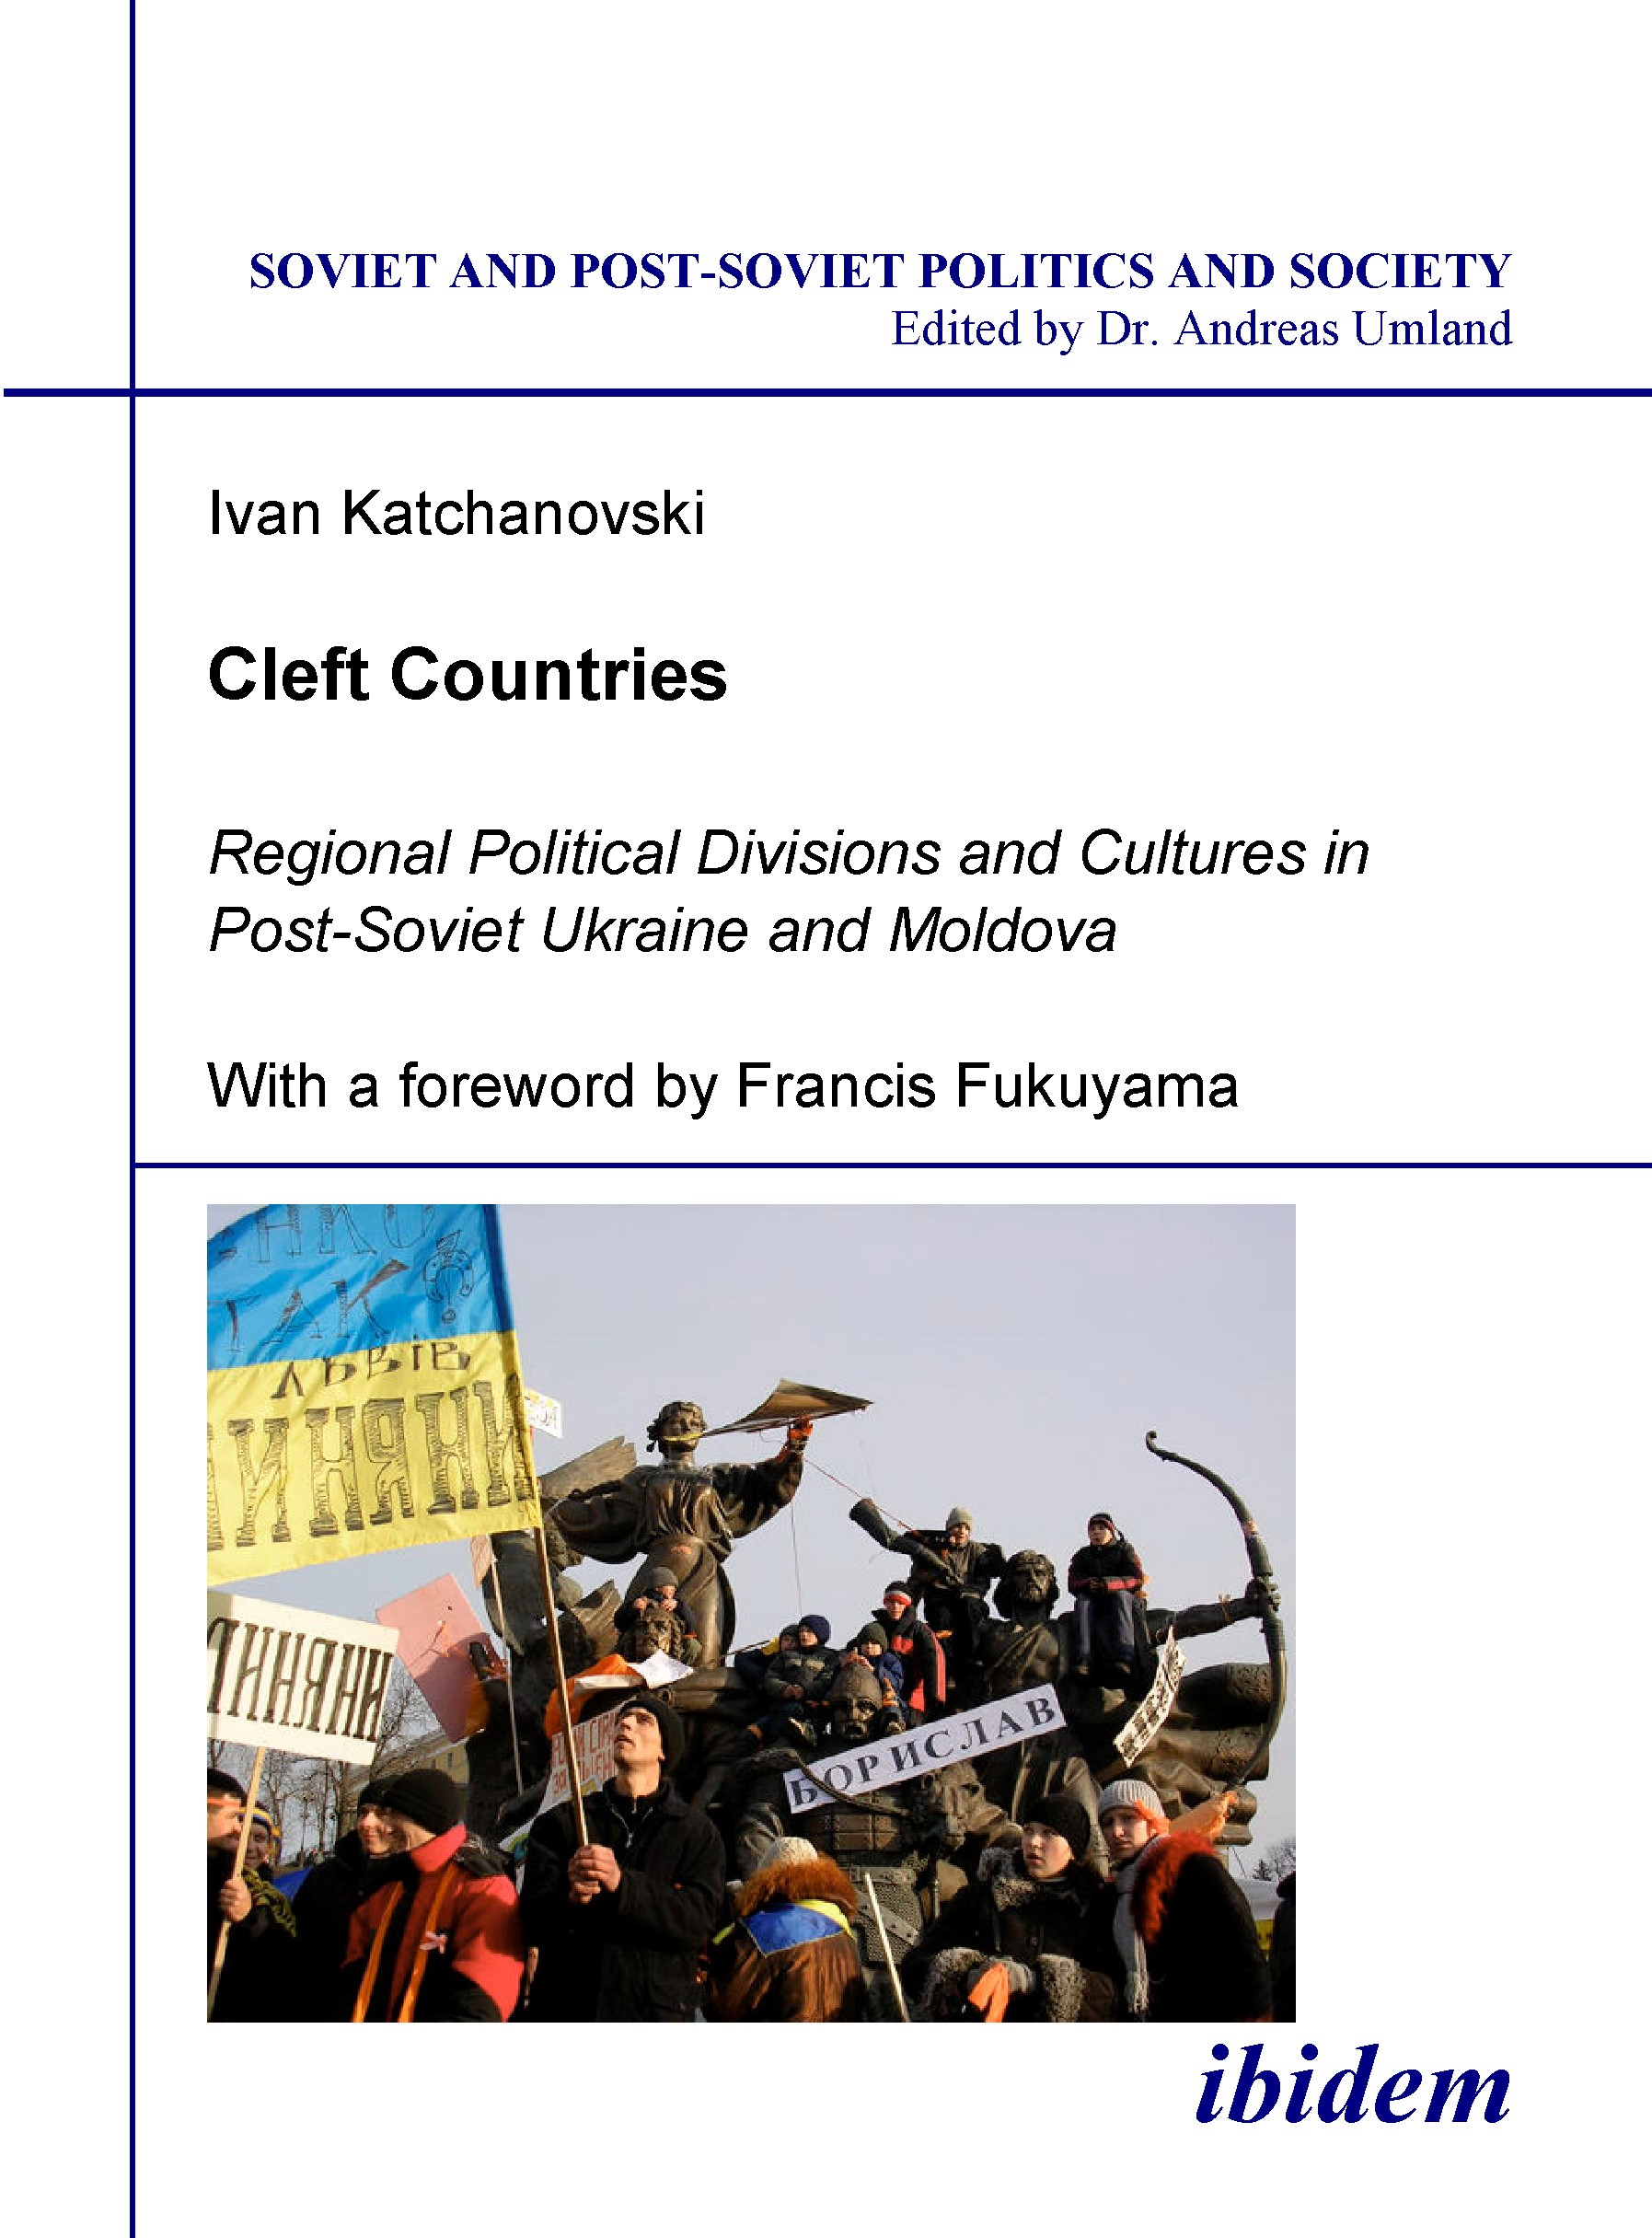 Cleft Countries | Katchanovski, 2006 (Cover)